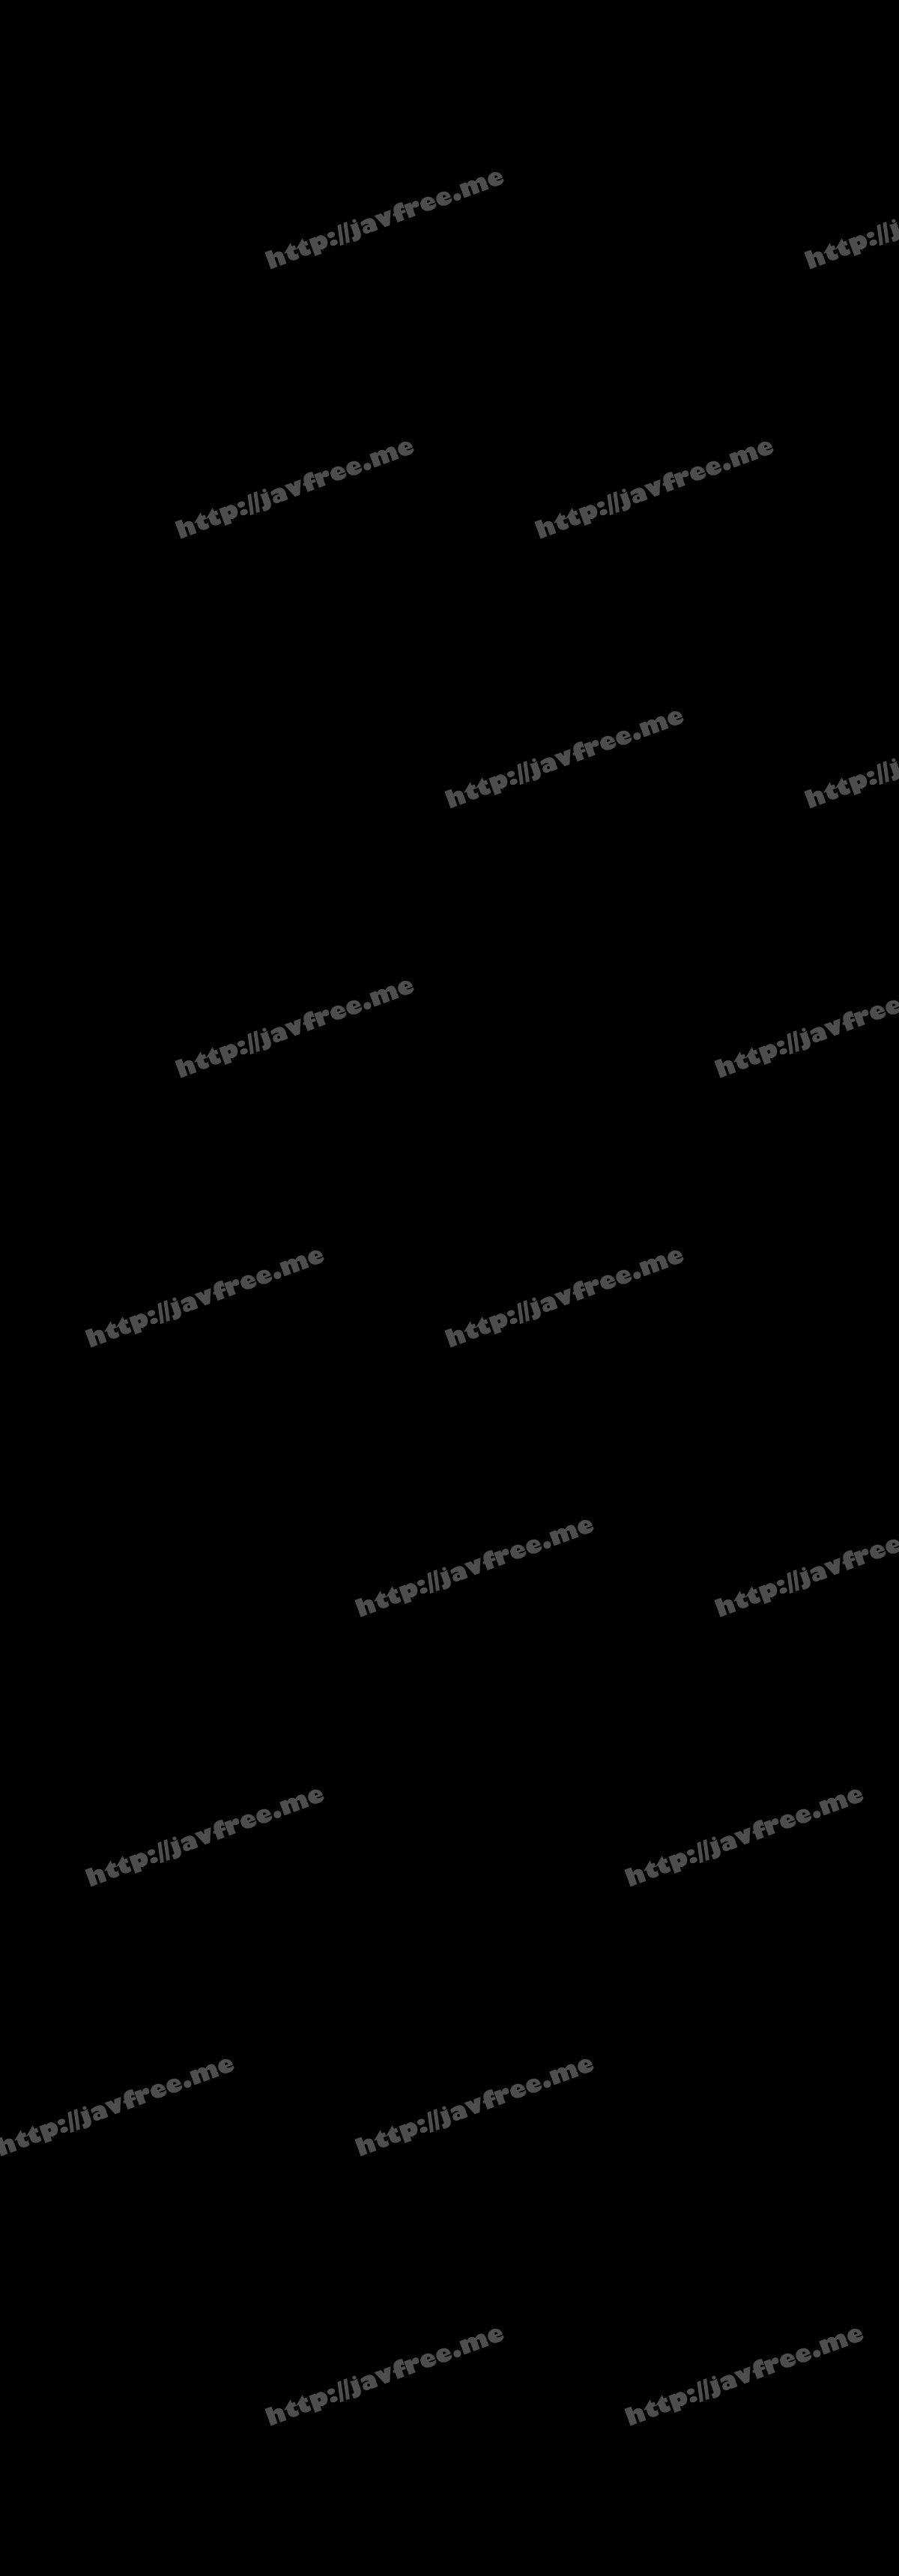 [HD][EYS-066] 細マッチョのガン突きに身悶える可愛いおばさん隠し撮りvol.2 - image EYS-066-1080p on https://javfree.me